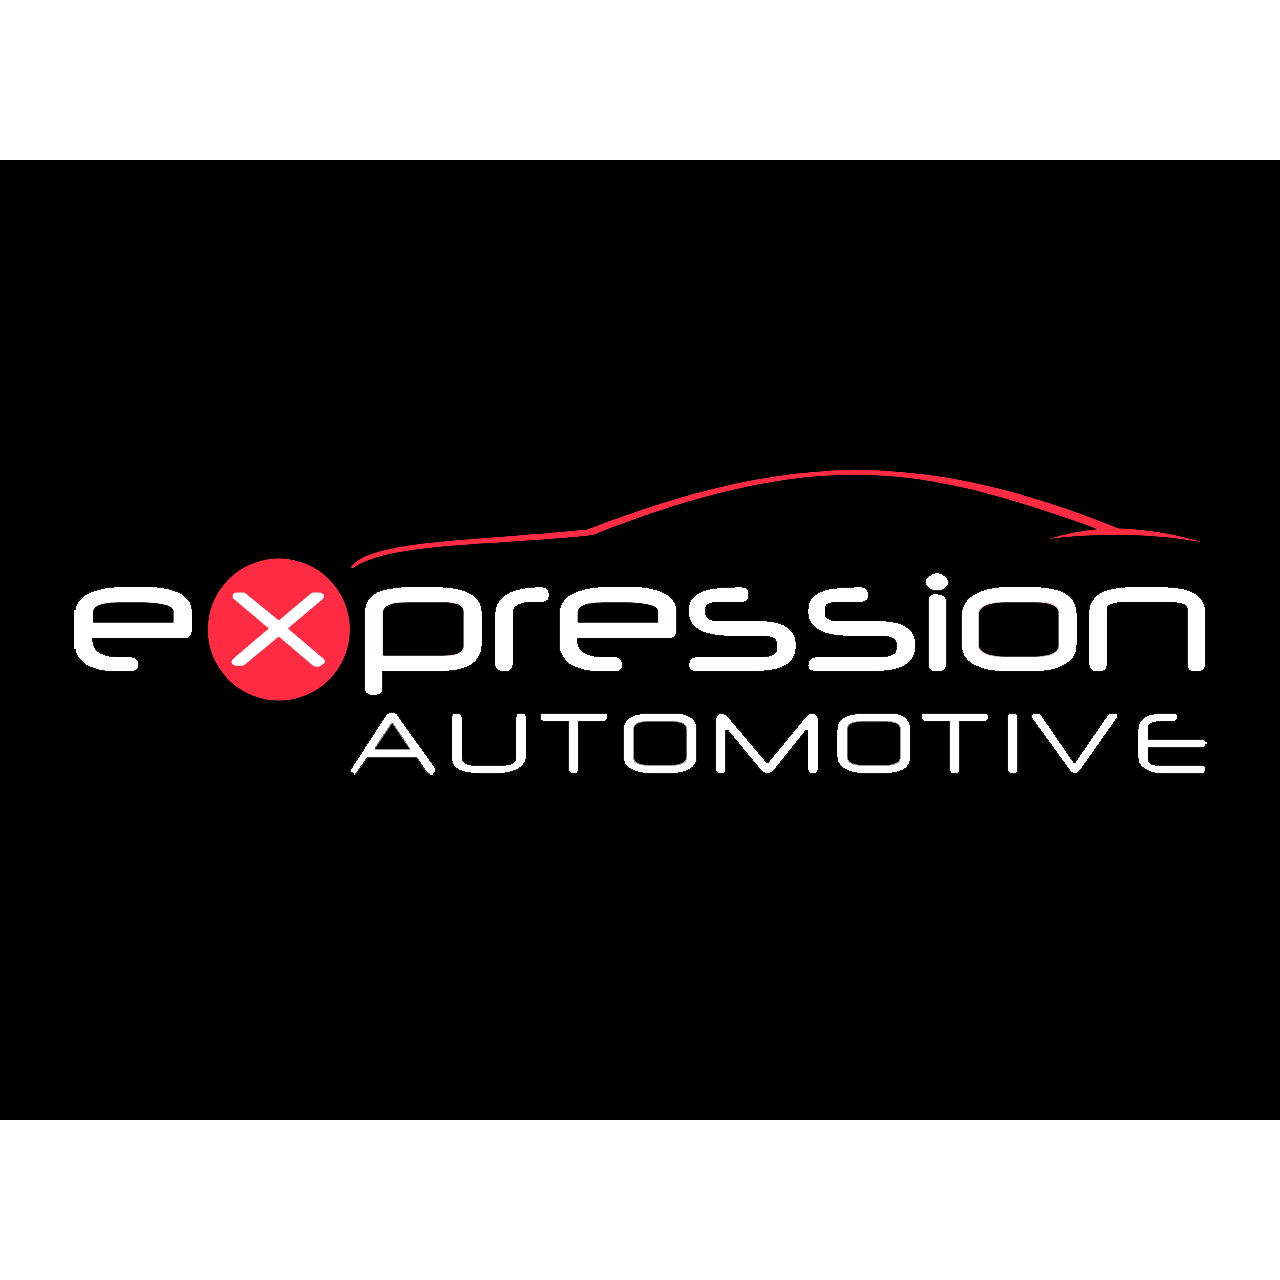 Expression Automotive - Shipley, West Yorkshire BD17 7JW - 01274 590522 | ShowMeLocal.com